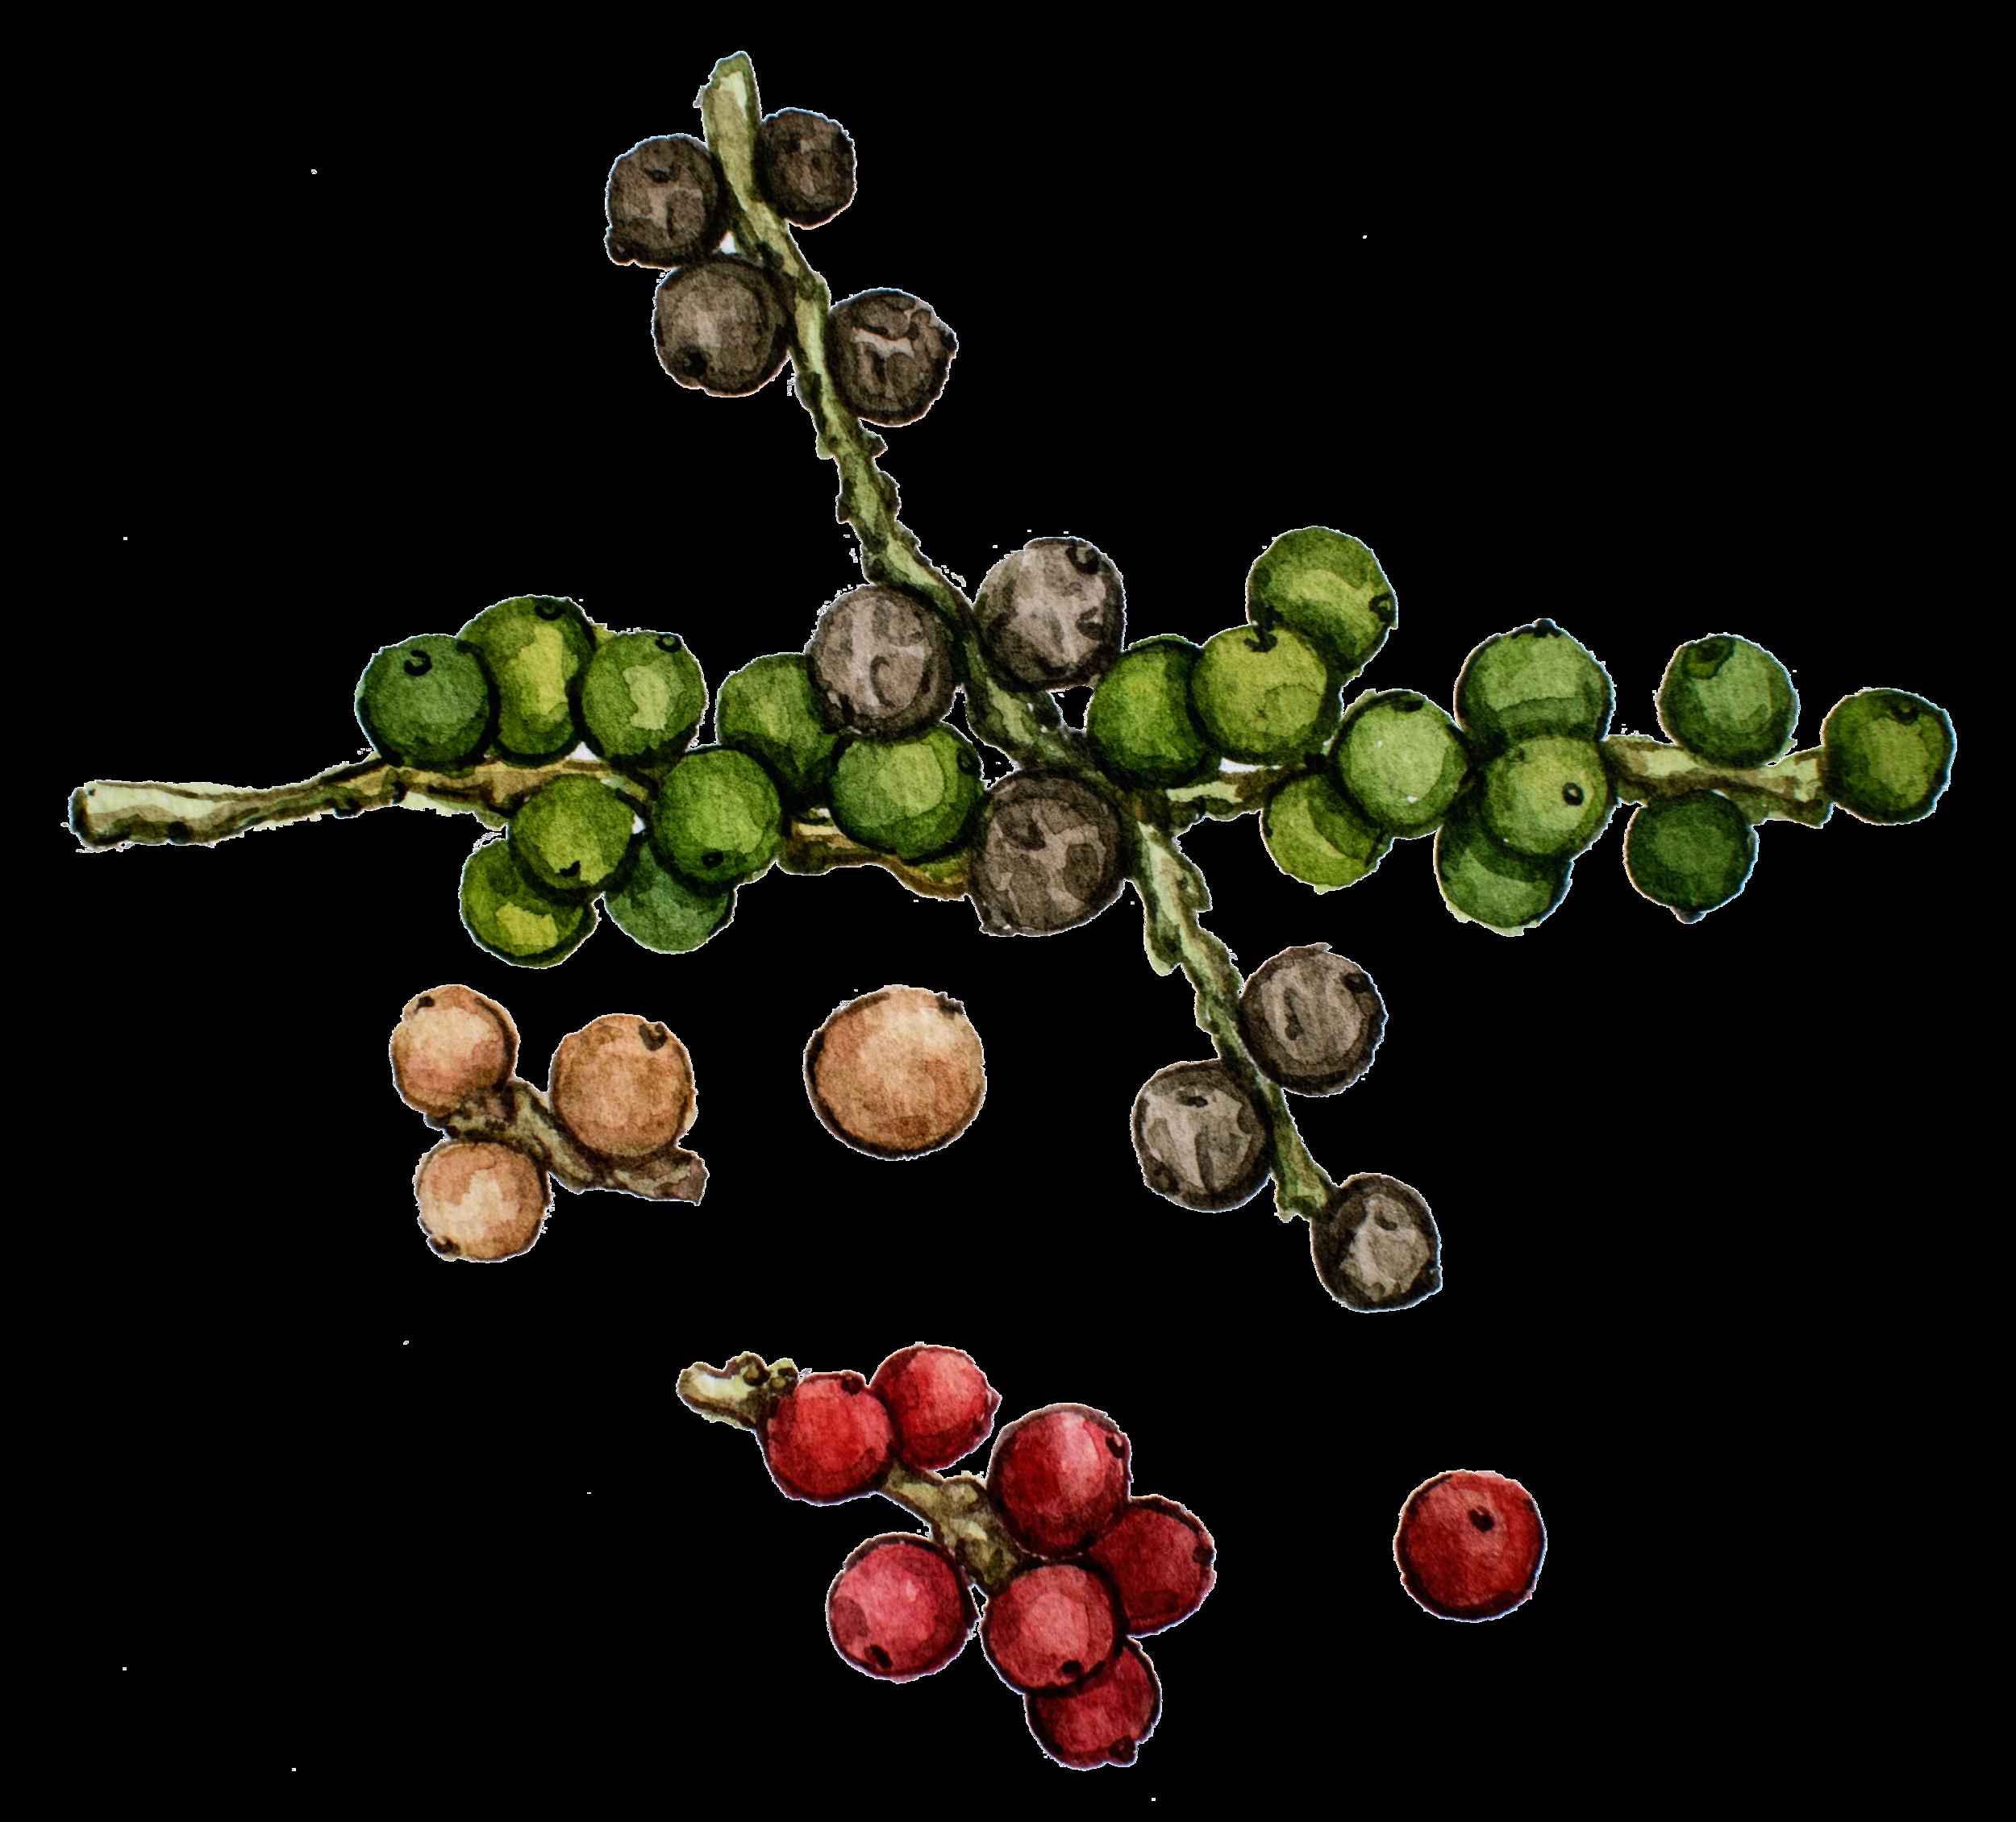 Peperine in Nootropic Supplements in Earthly Biotics Global Focus